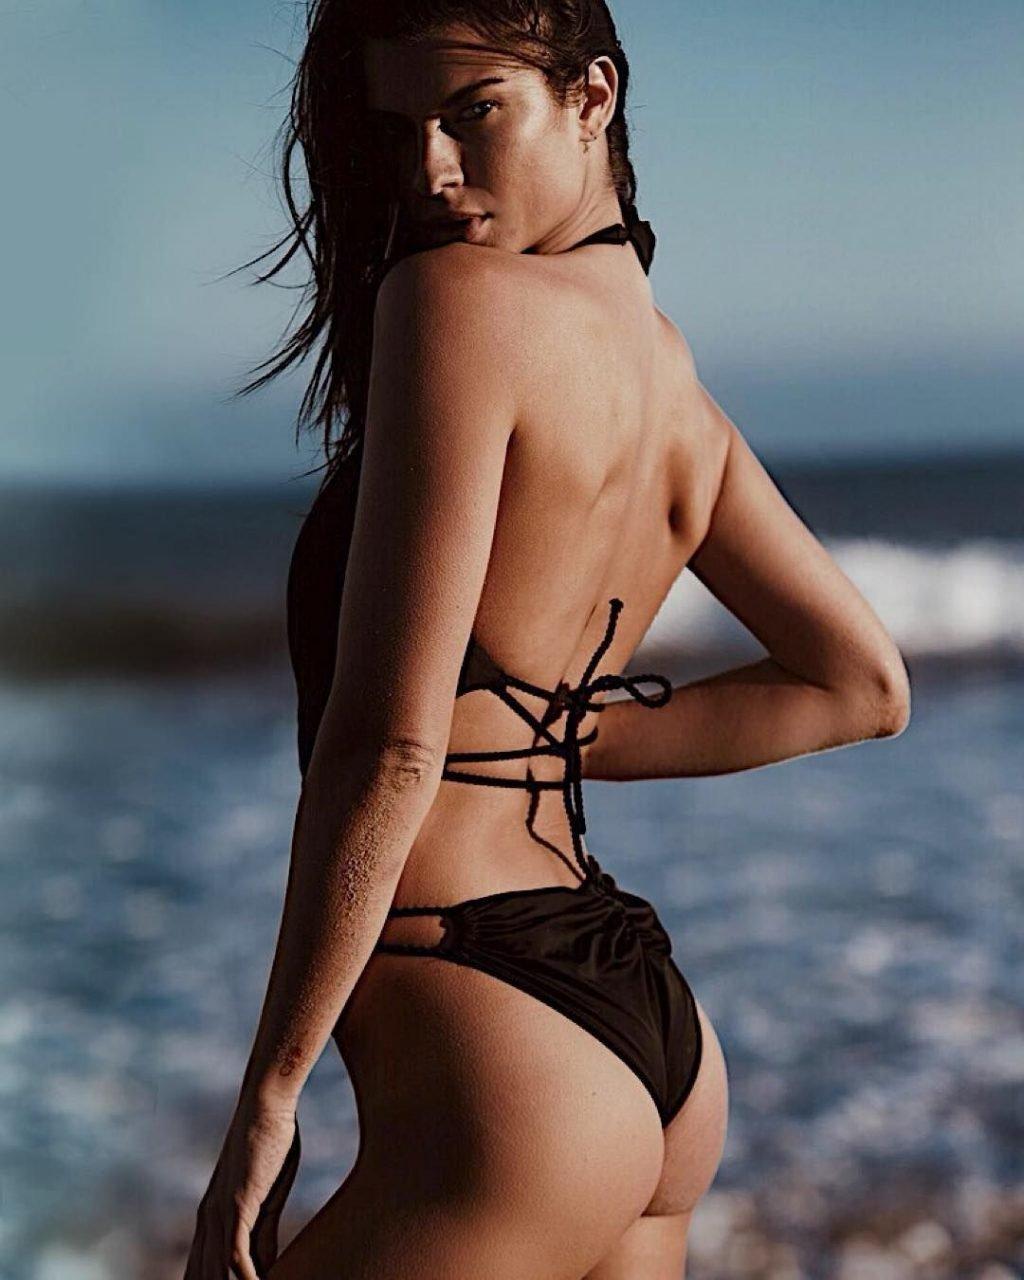 Destiny DeLisio Sexy & Topless (84 Photos)